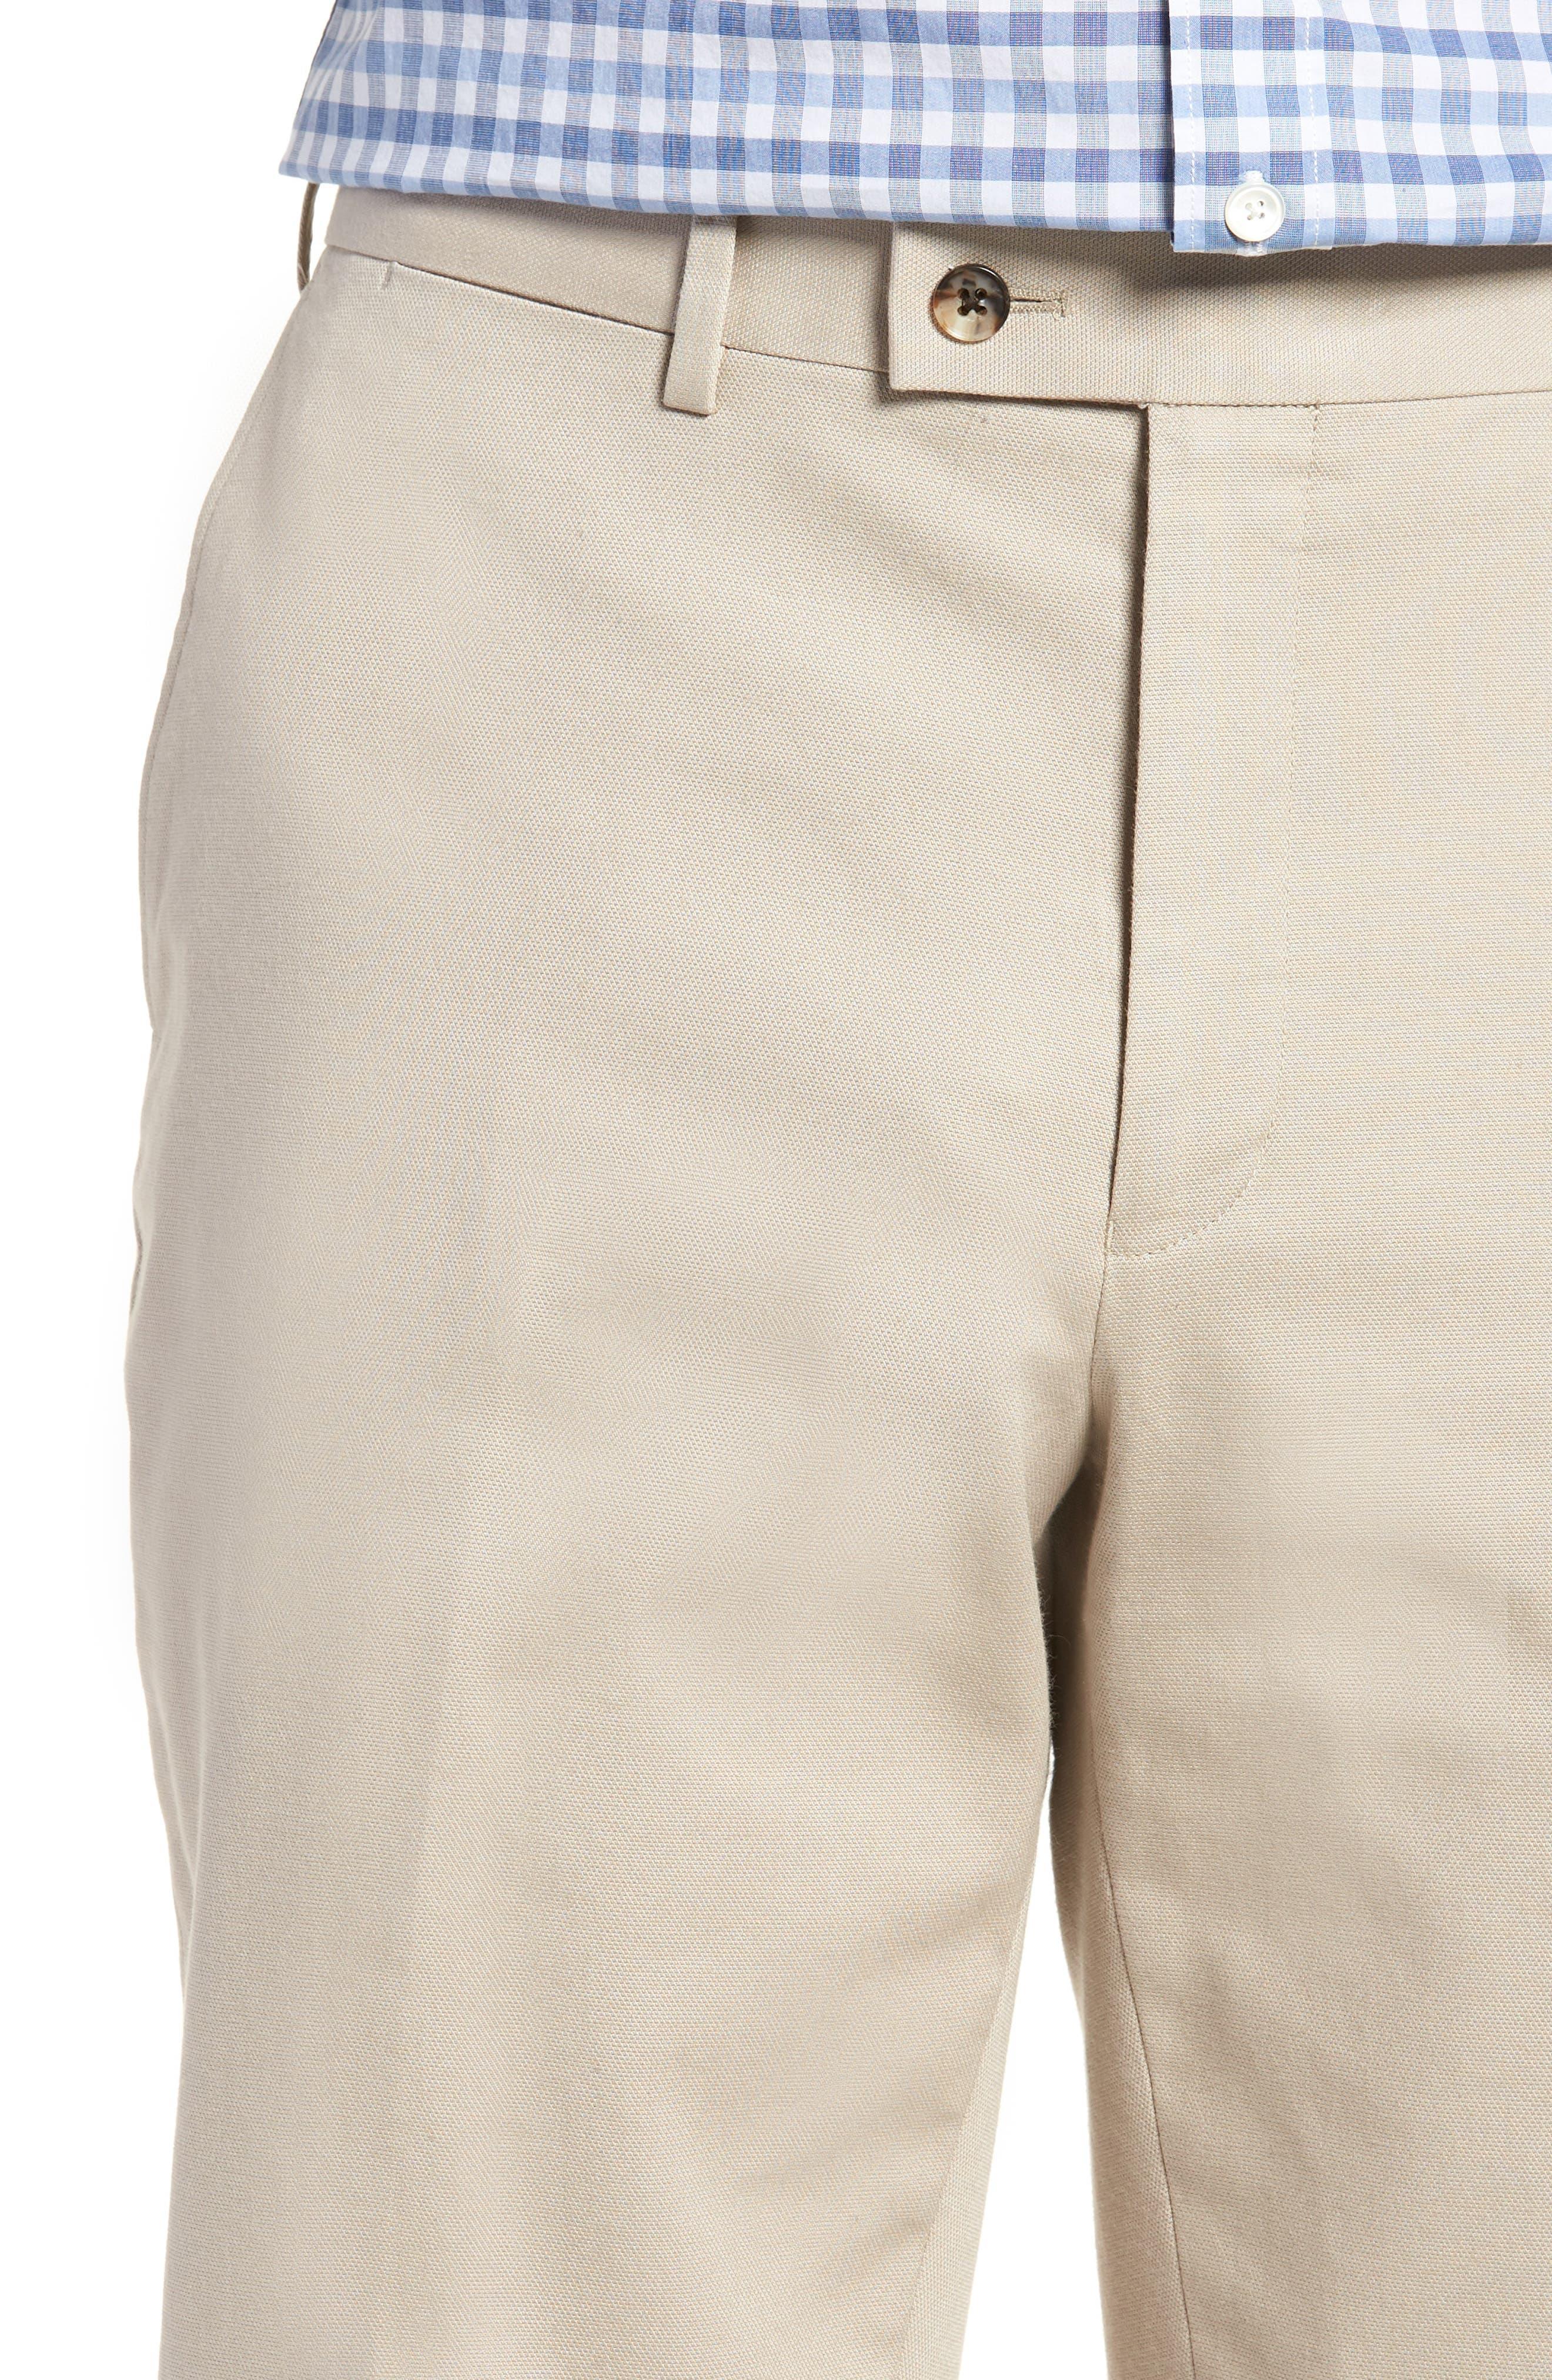 Finchley Regular Fit Pants,                             Alternate thumbnail 4, color,                             102